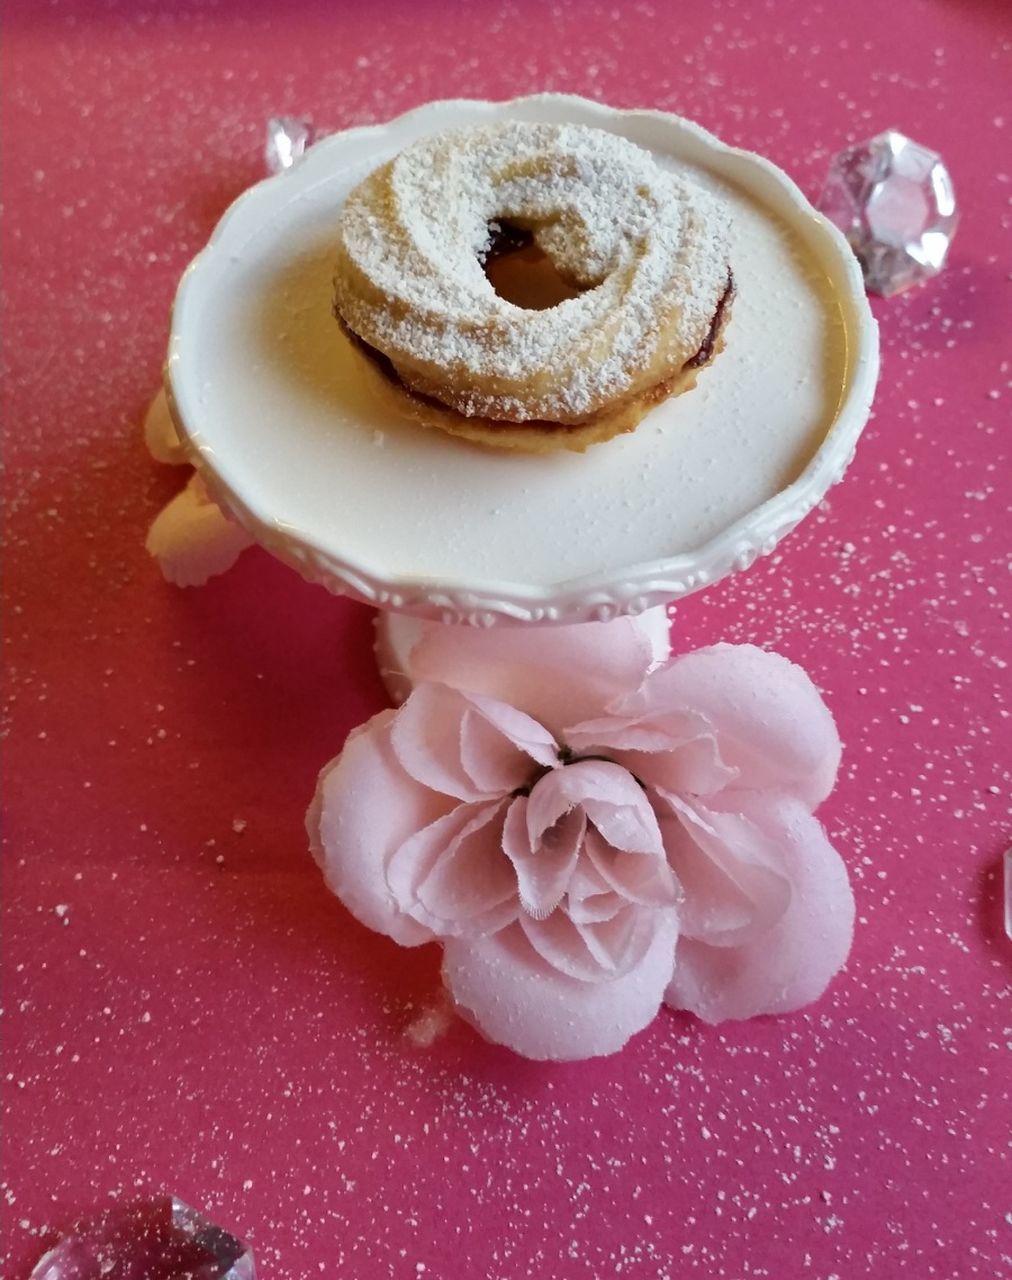 Close-Up Of Dessert On Cake Stand